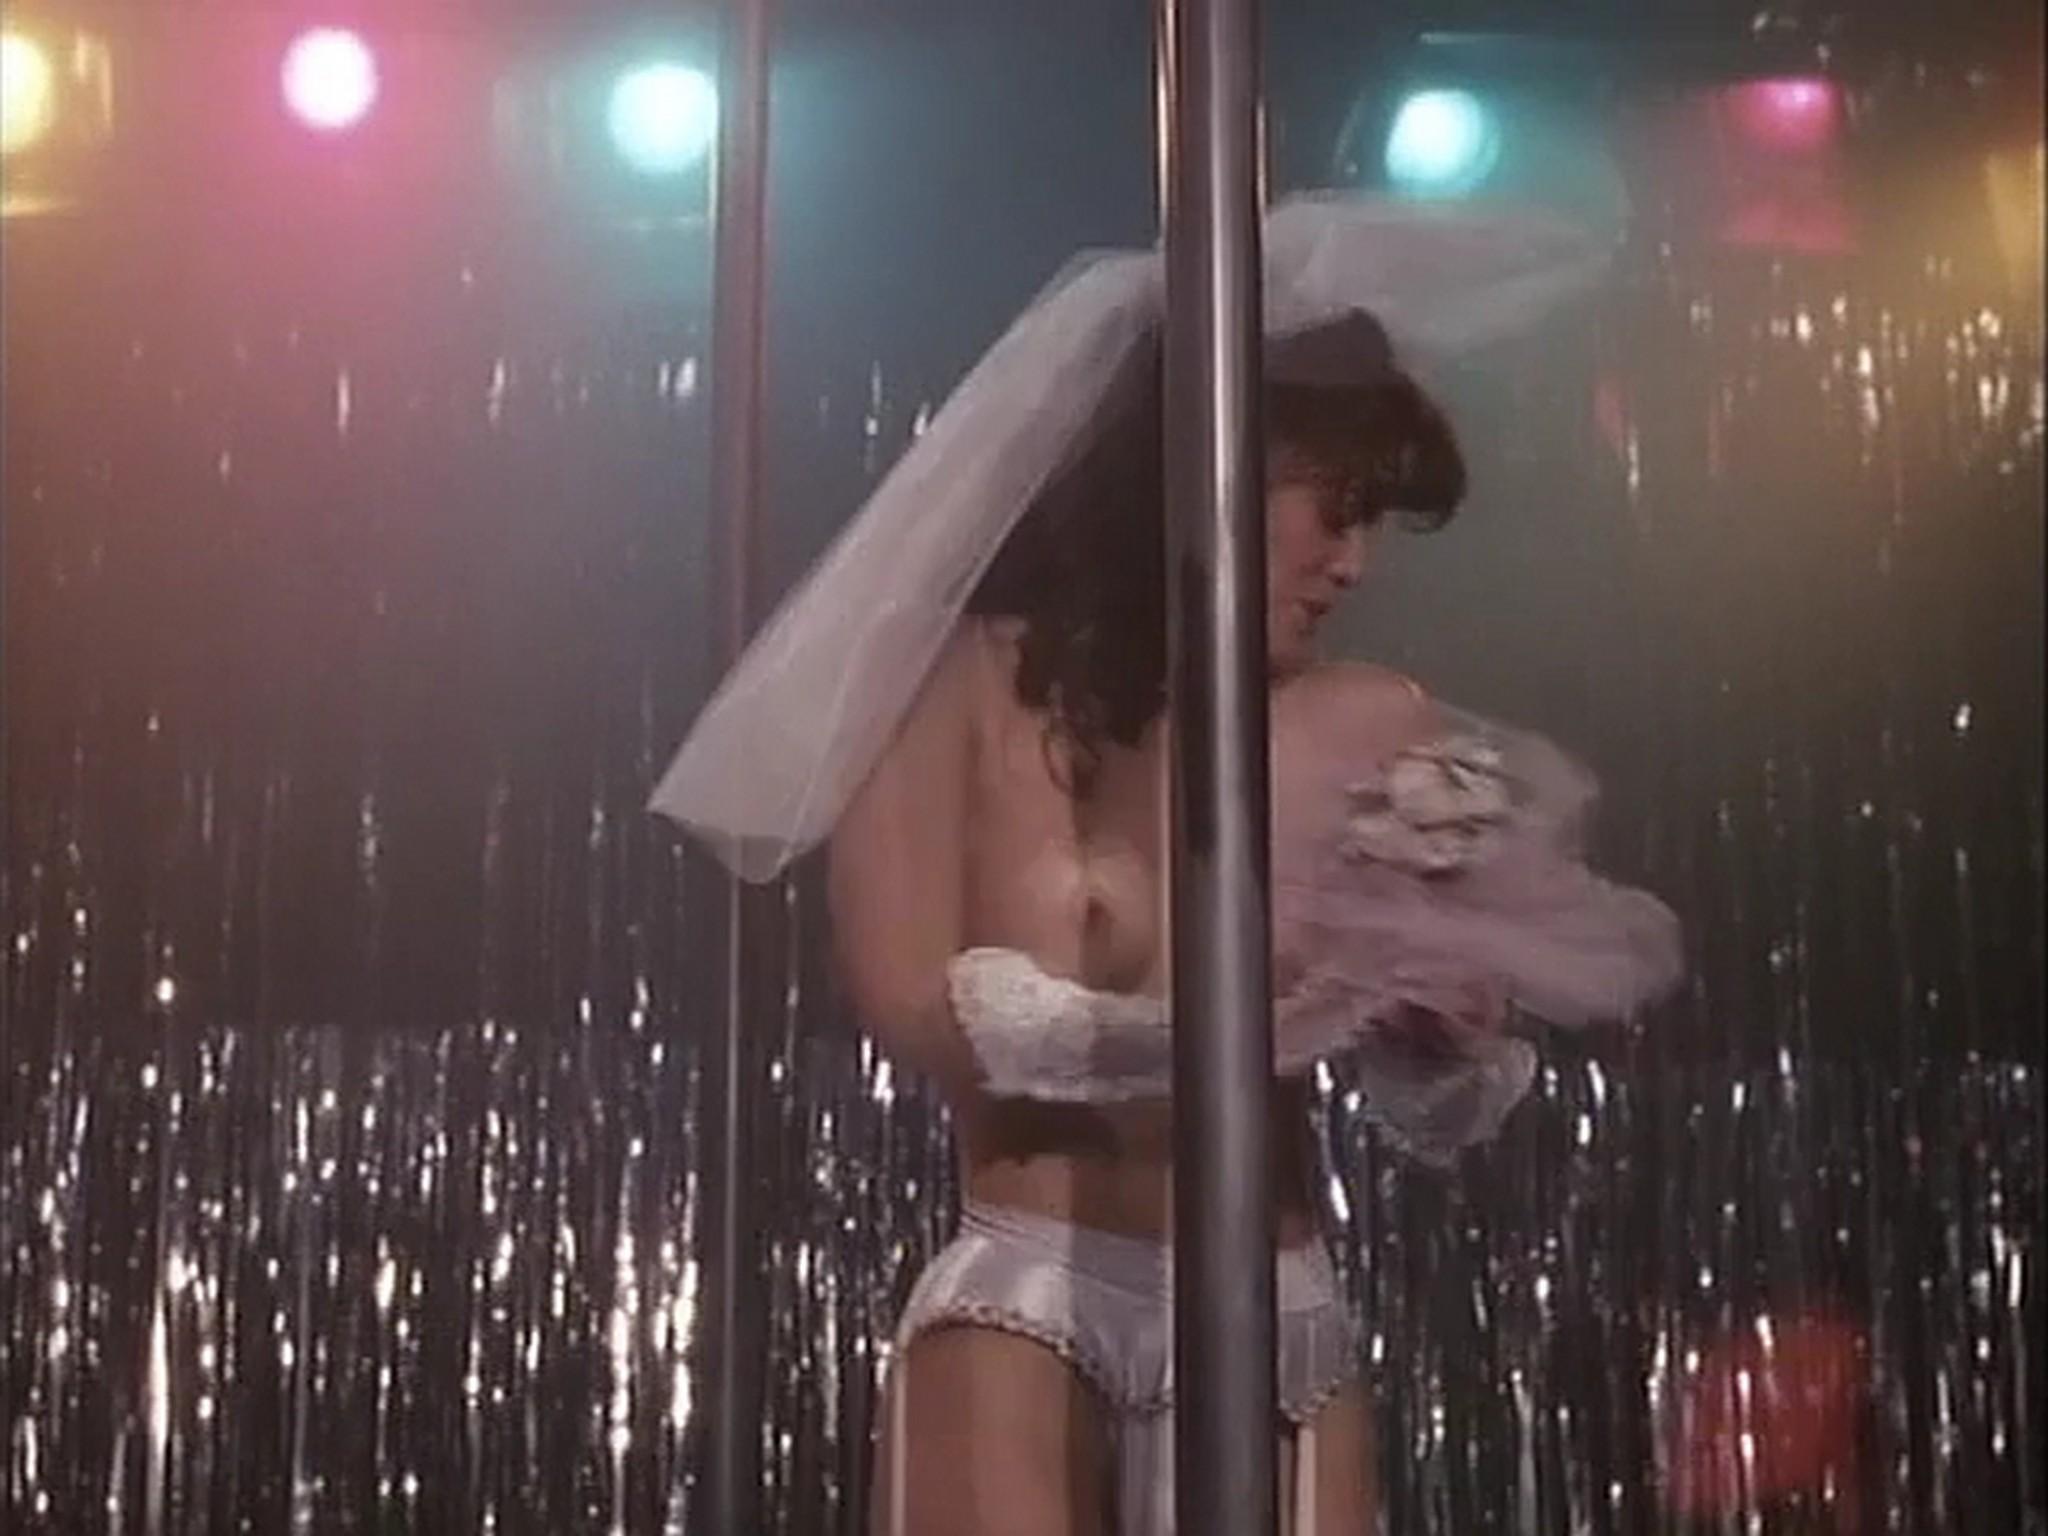 Barbara Alyn Woods nude Catya Sassoon Jill Pierce nude too as strippers Dance with Death 1991 3